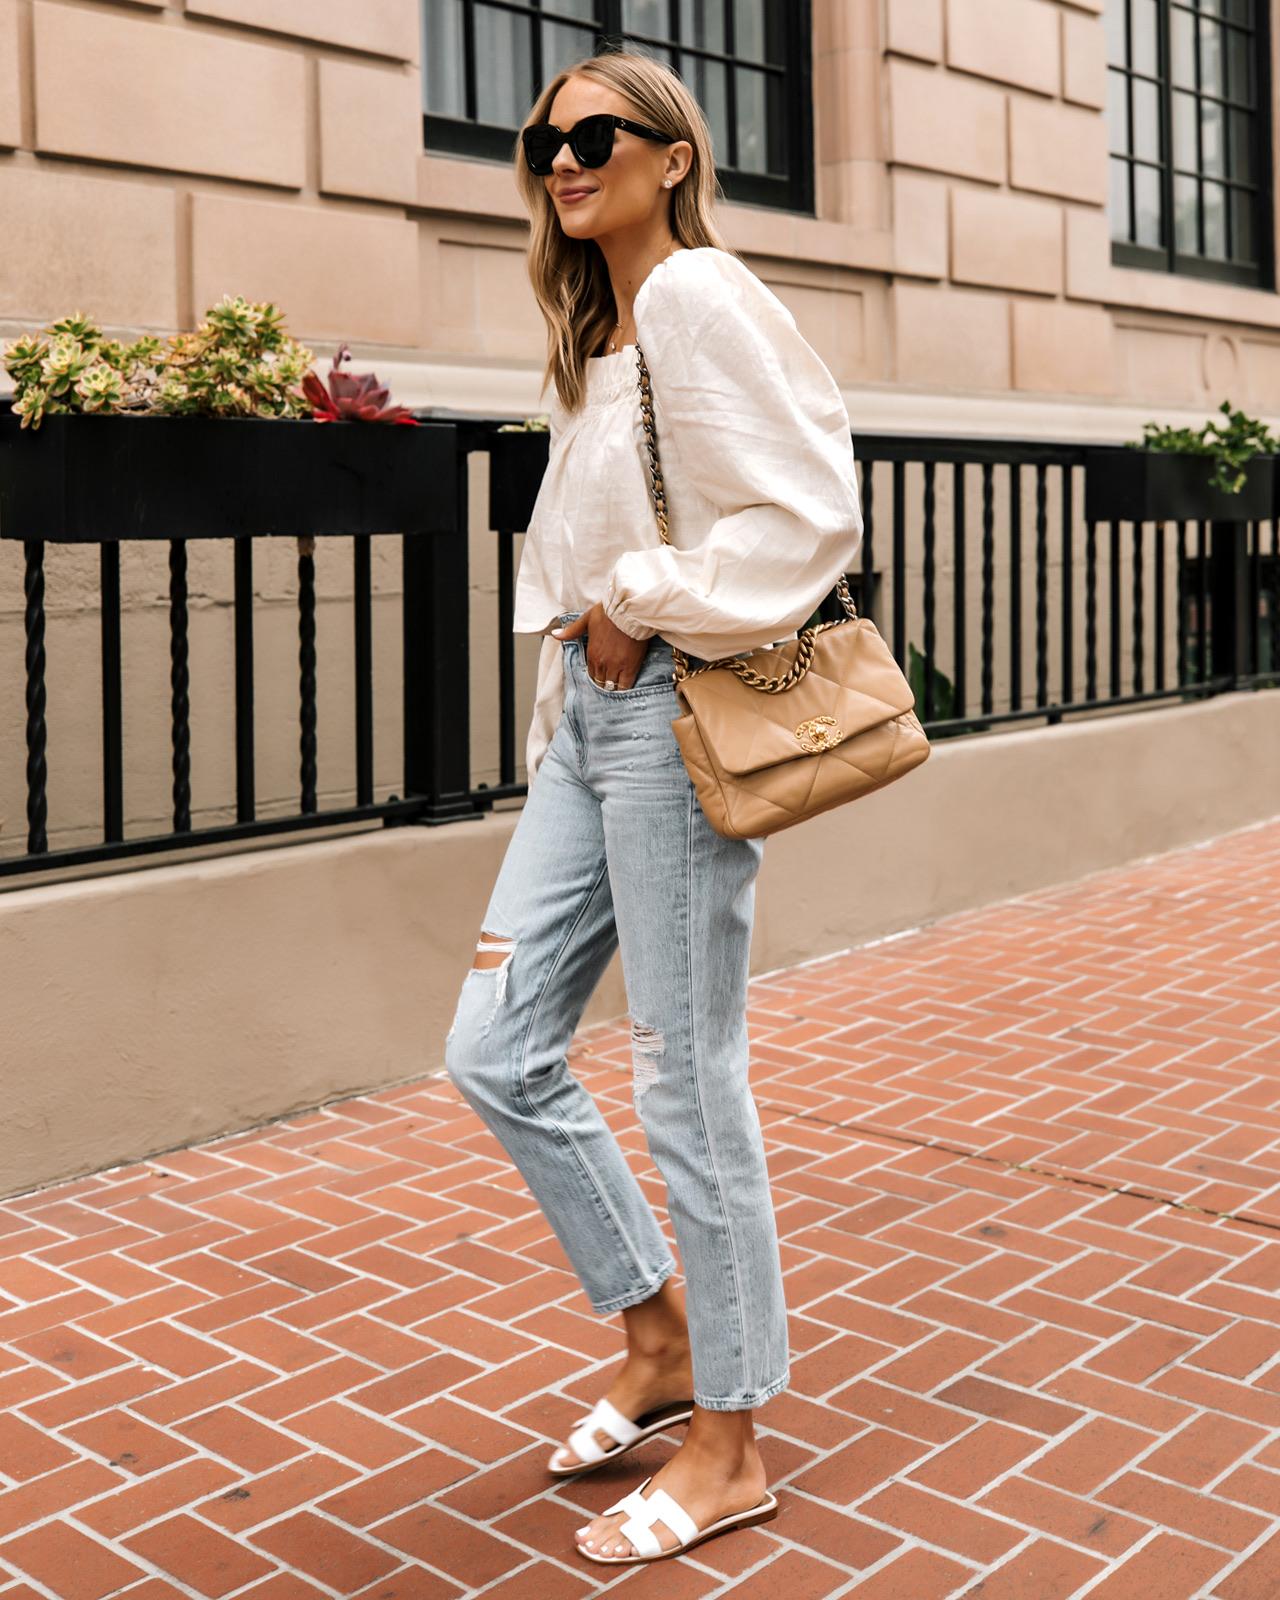 Fashion Jackson Wearing Beige Linen Puff Sleeve Top Madewell Ripped Jeans Hermes White Sandals Chanel 19 Beige Handbag